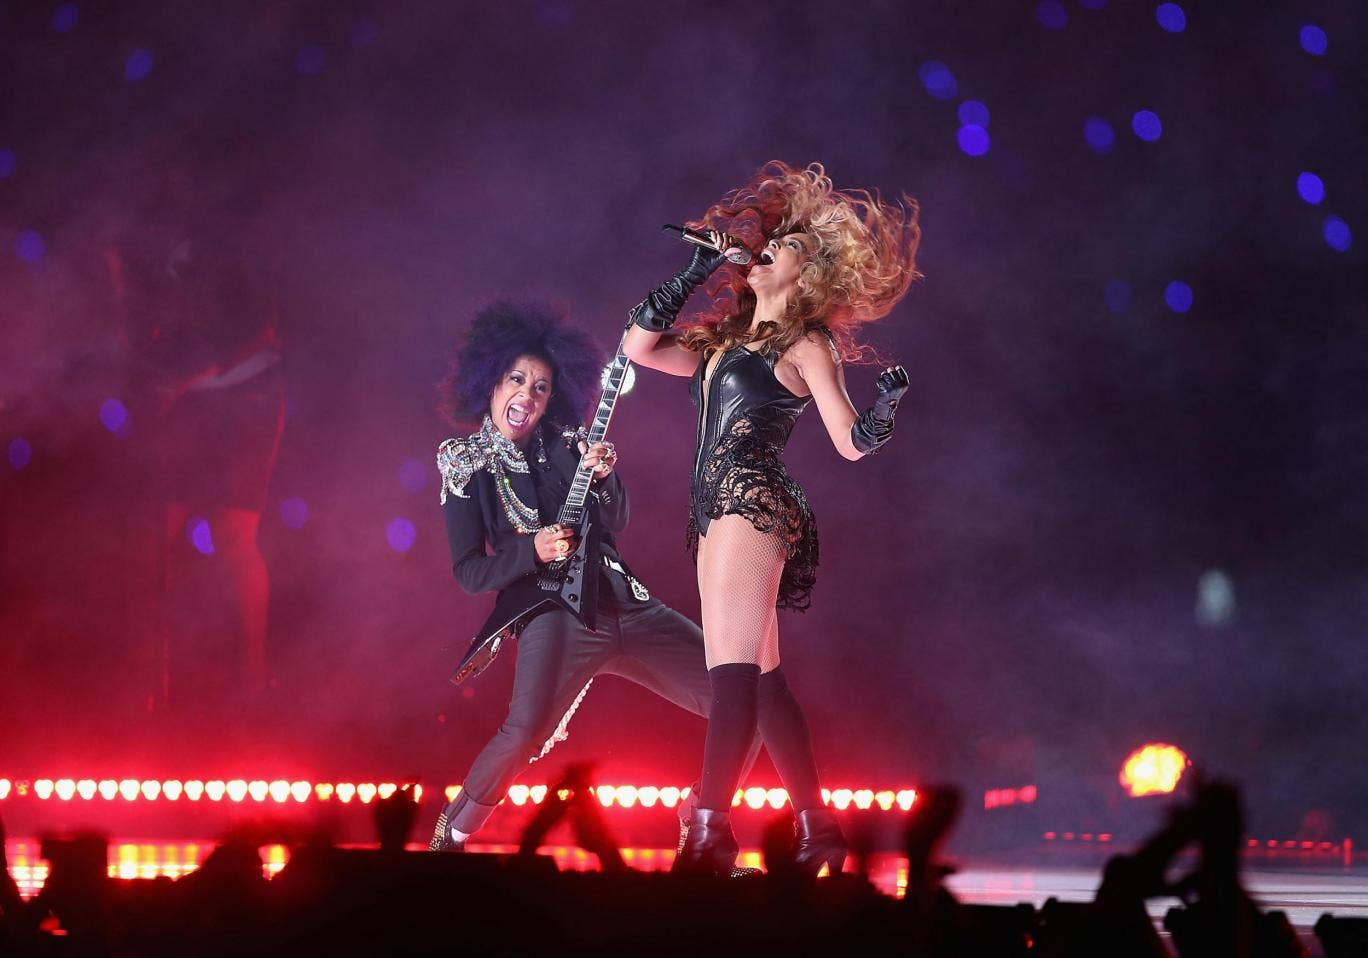 Beyonce announces Formation world tour during Super Bowl